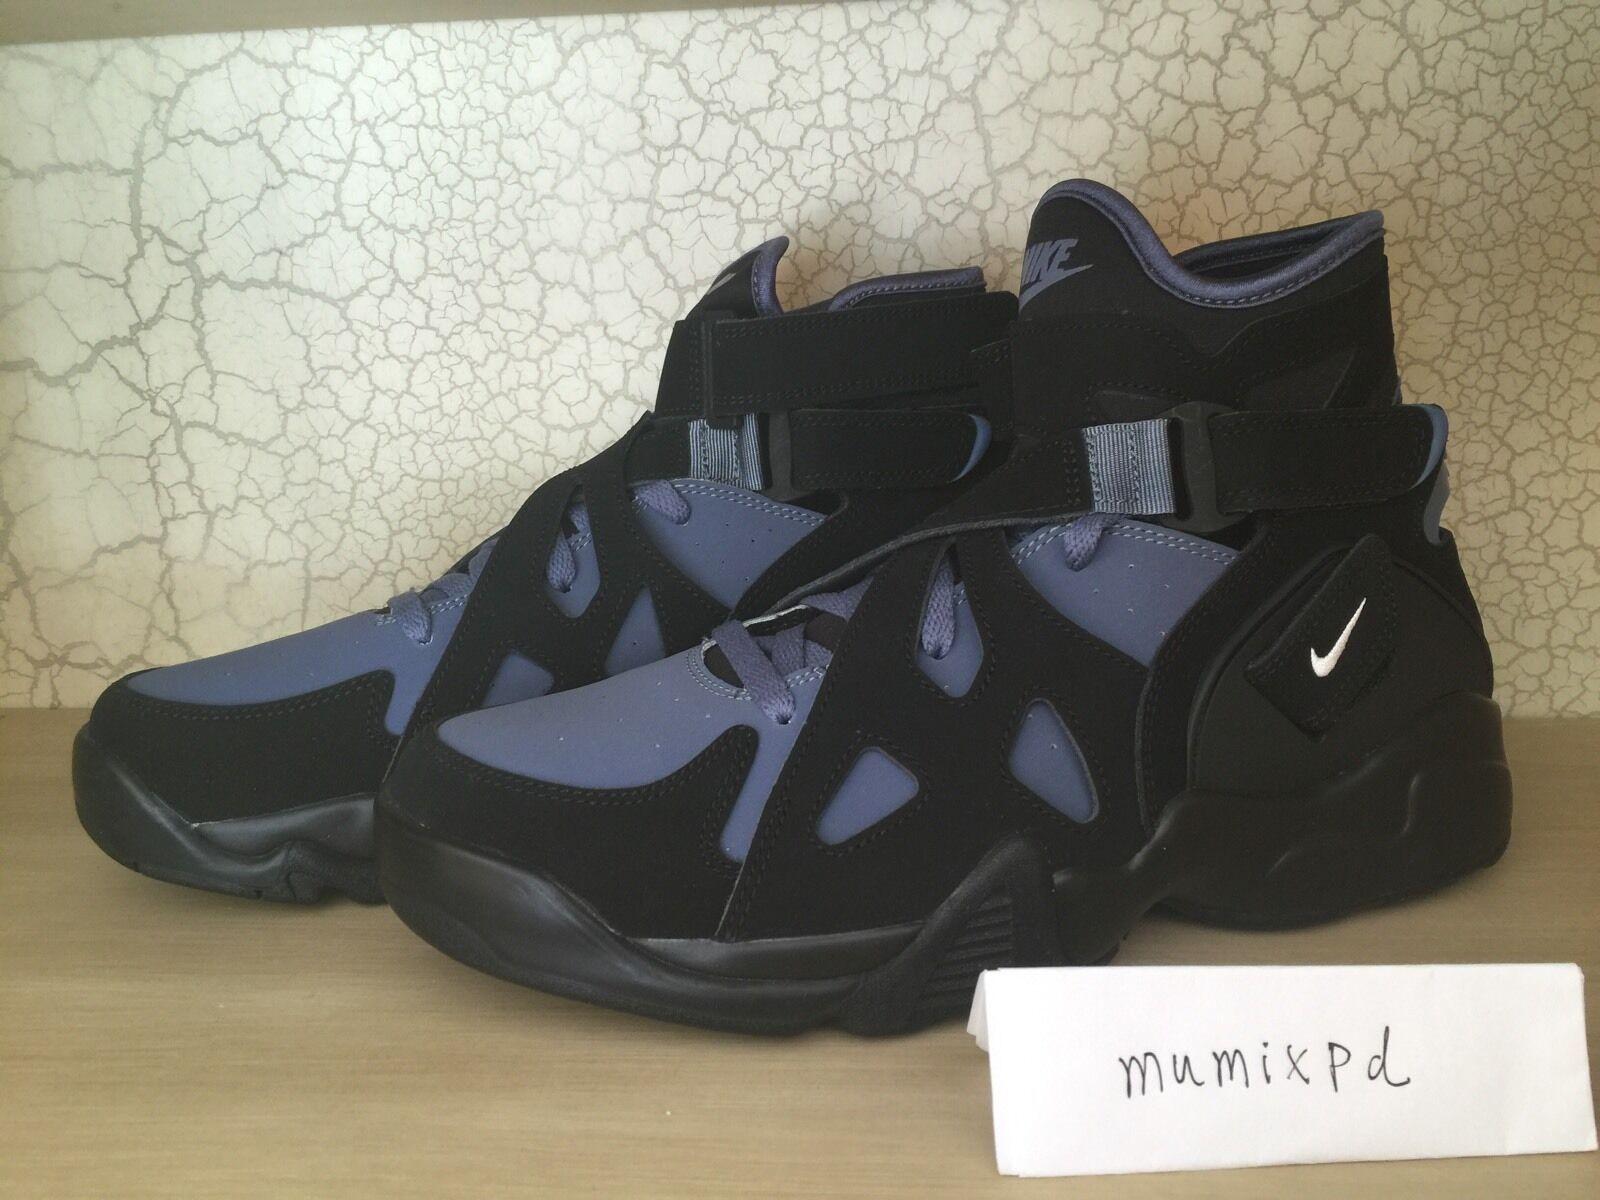 Nike air iv jordan retr 1 nero iv air vi - v ardesia blu oltremare 889013-003 9,5 44892d